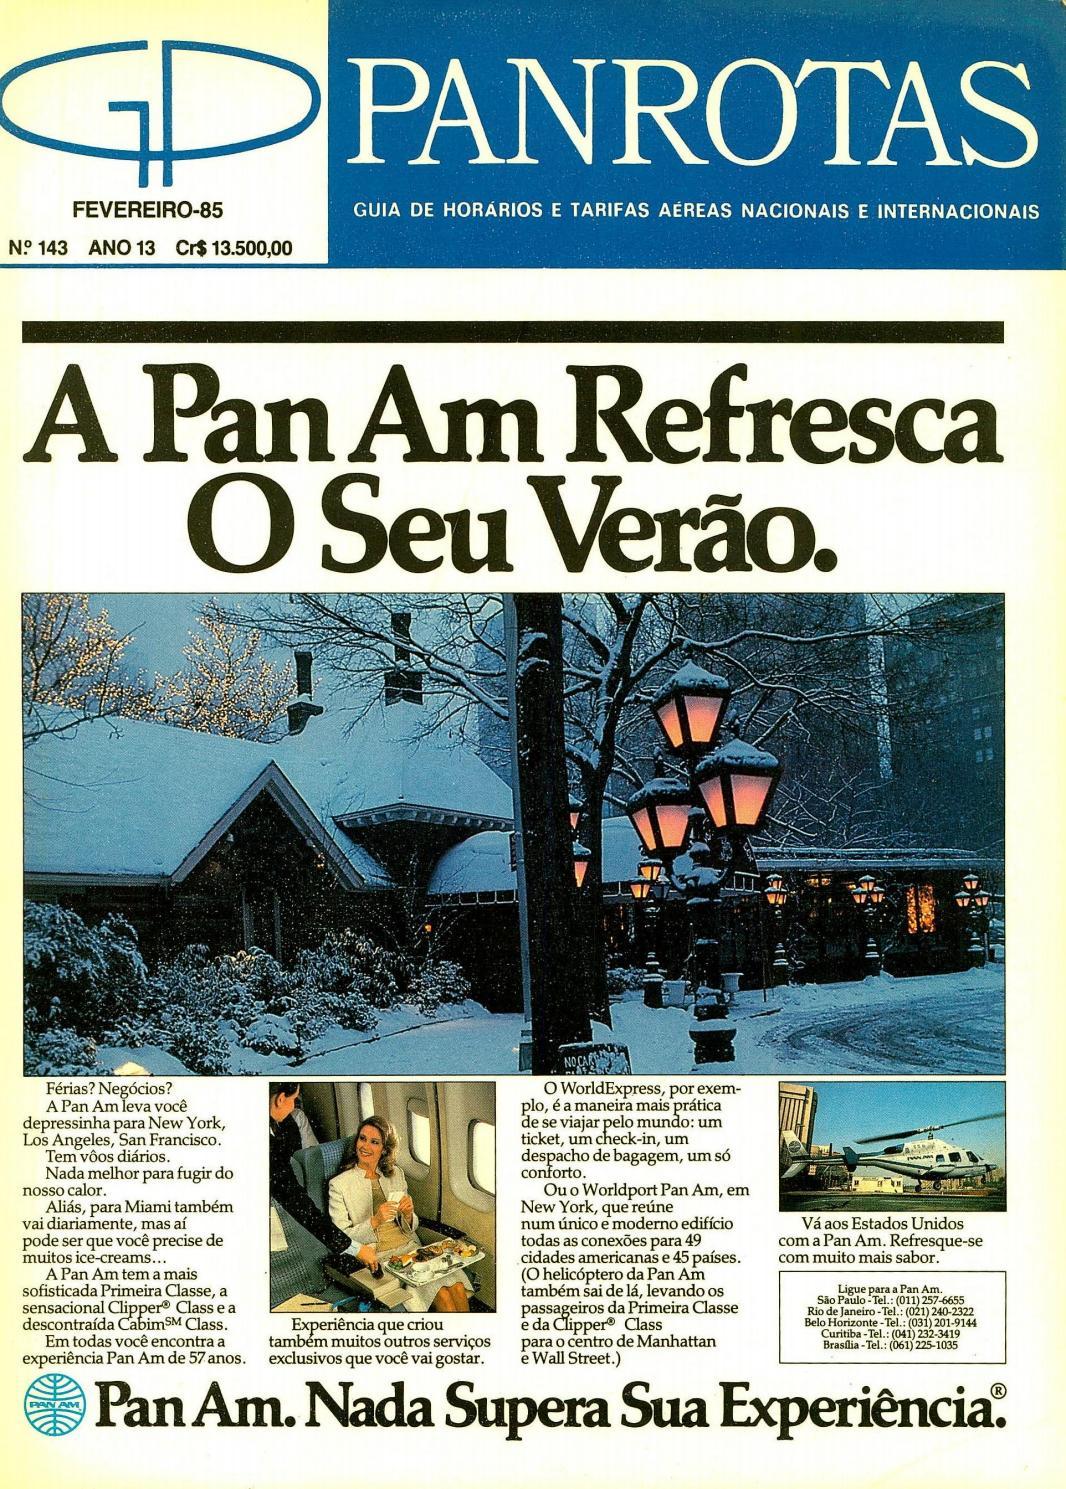 8c198aa078c Guia PANROTAS - Edição 143 - Fevereiro 1985 by PANROTAS Editora - issuu